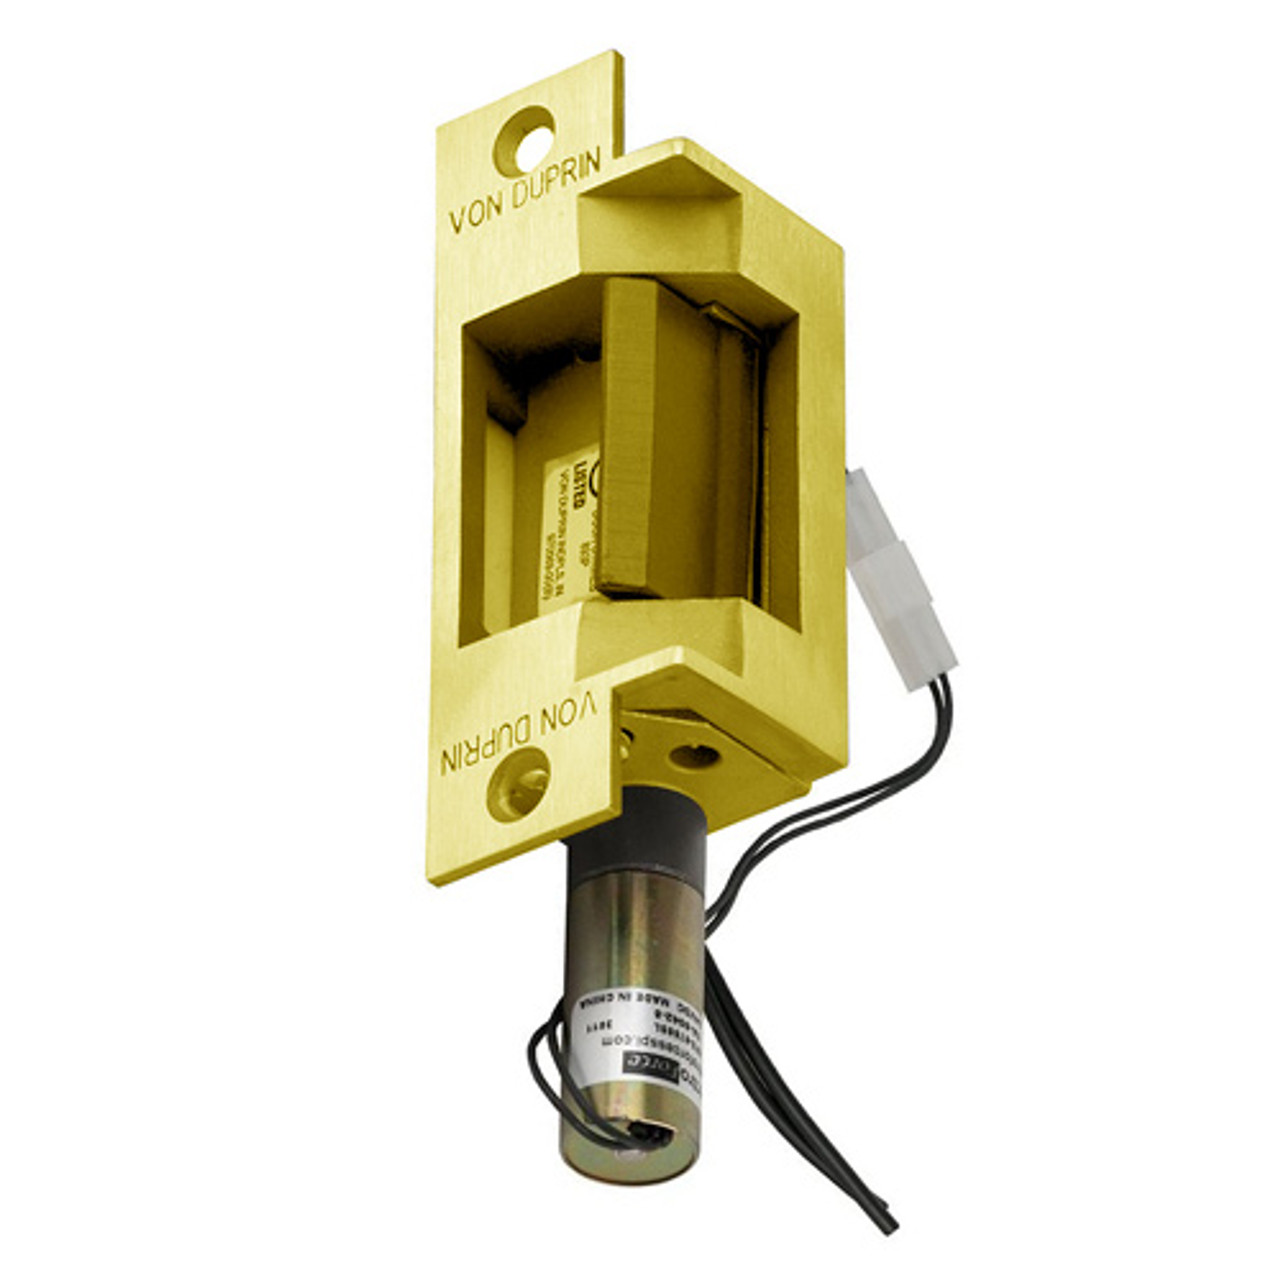 6211-DS-12VDC-US3 Von Duprin Electric Strike in Bright Brass Finish